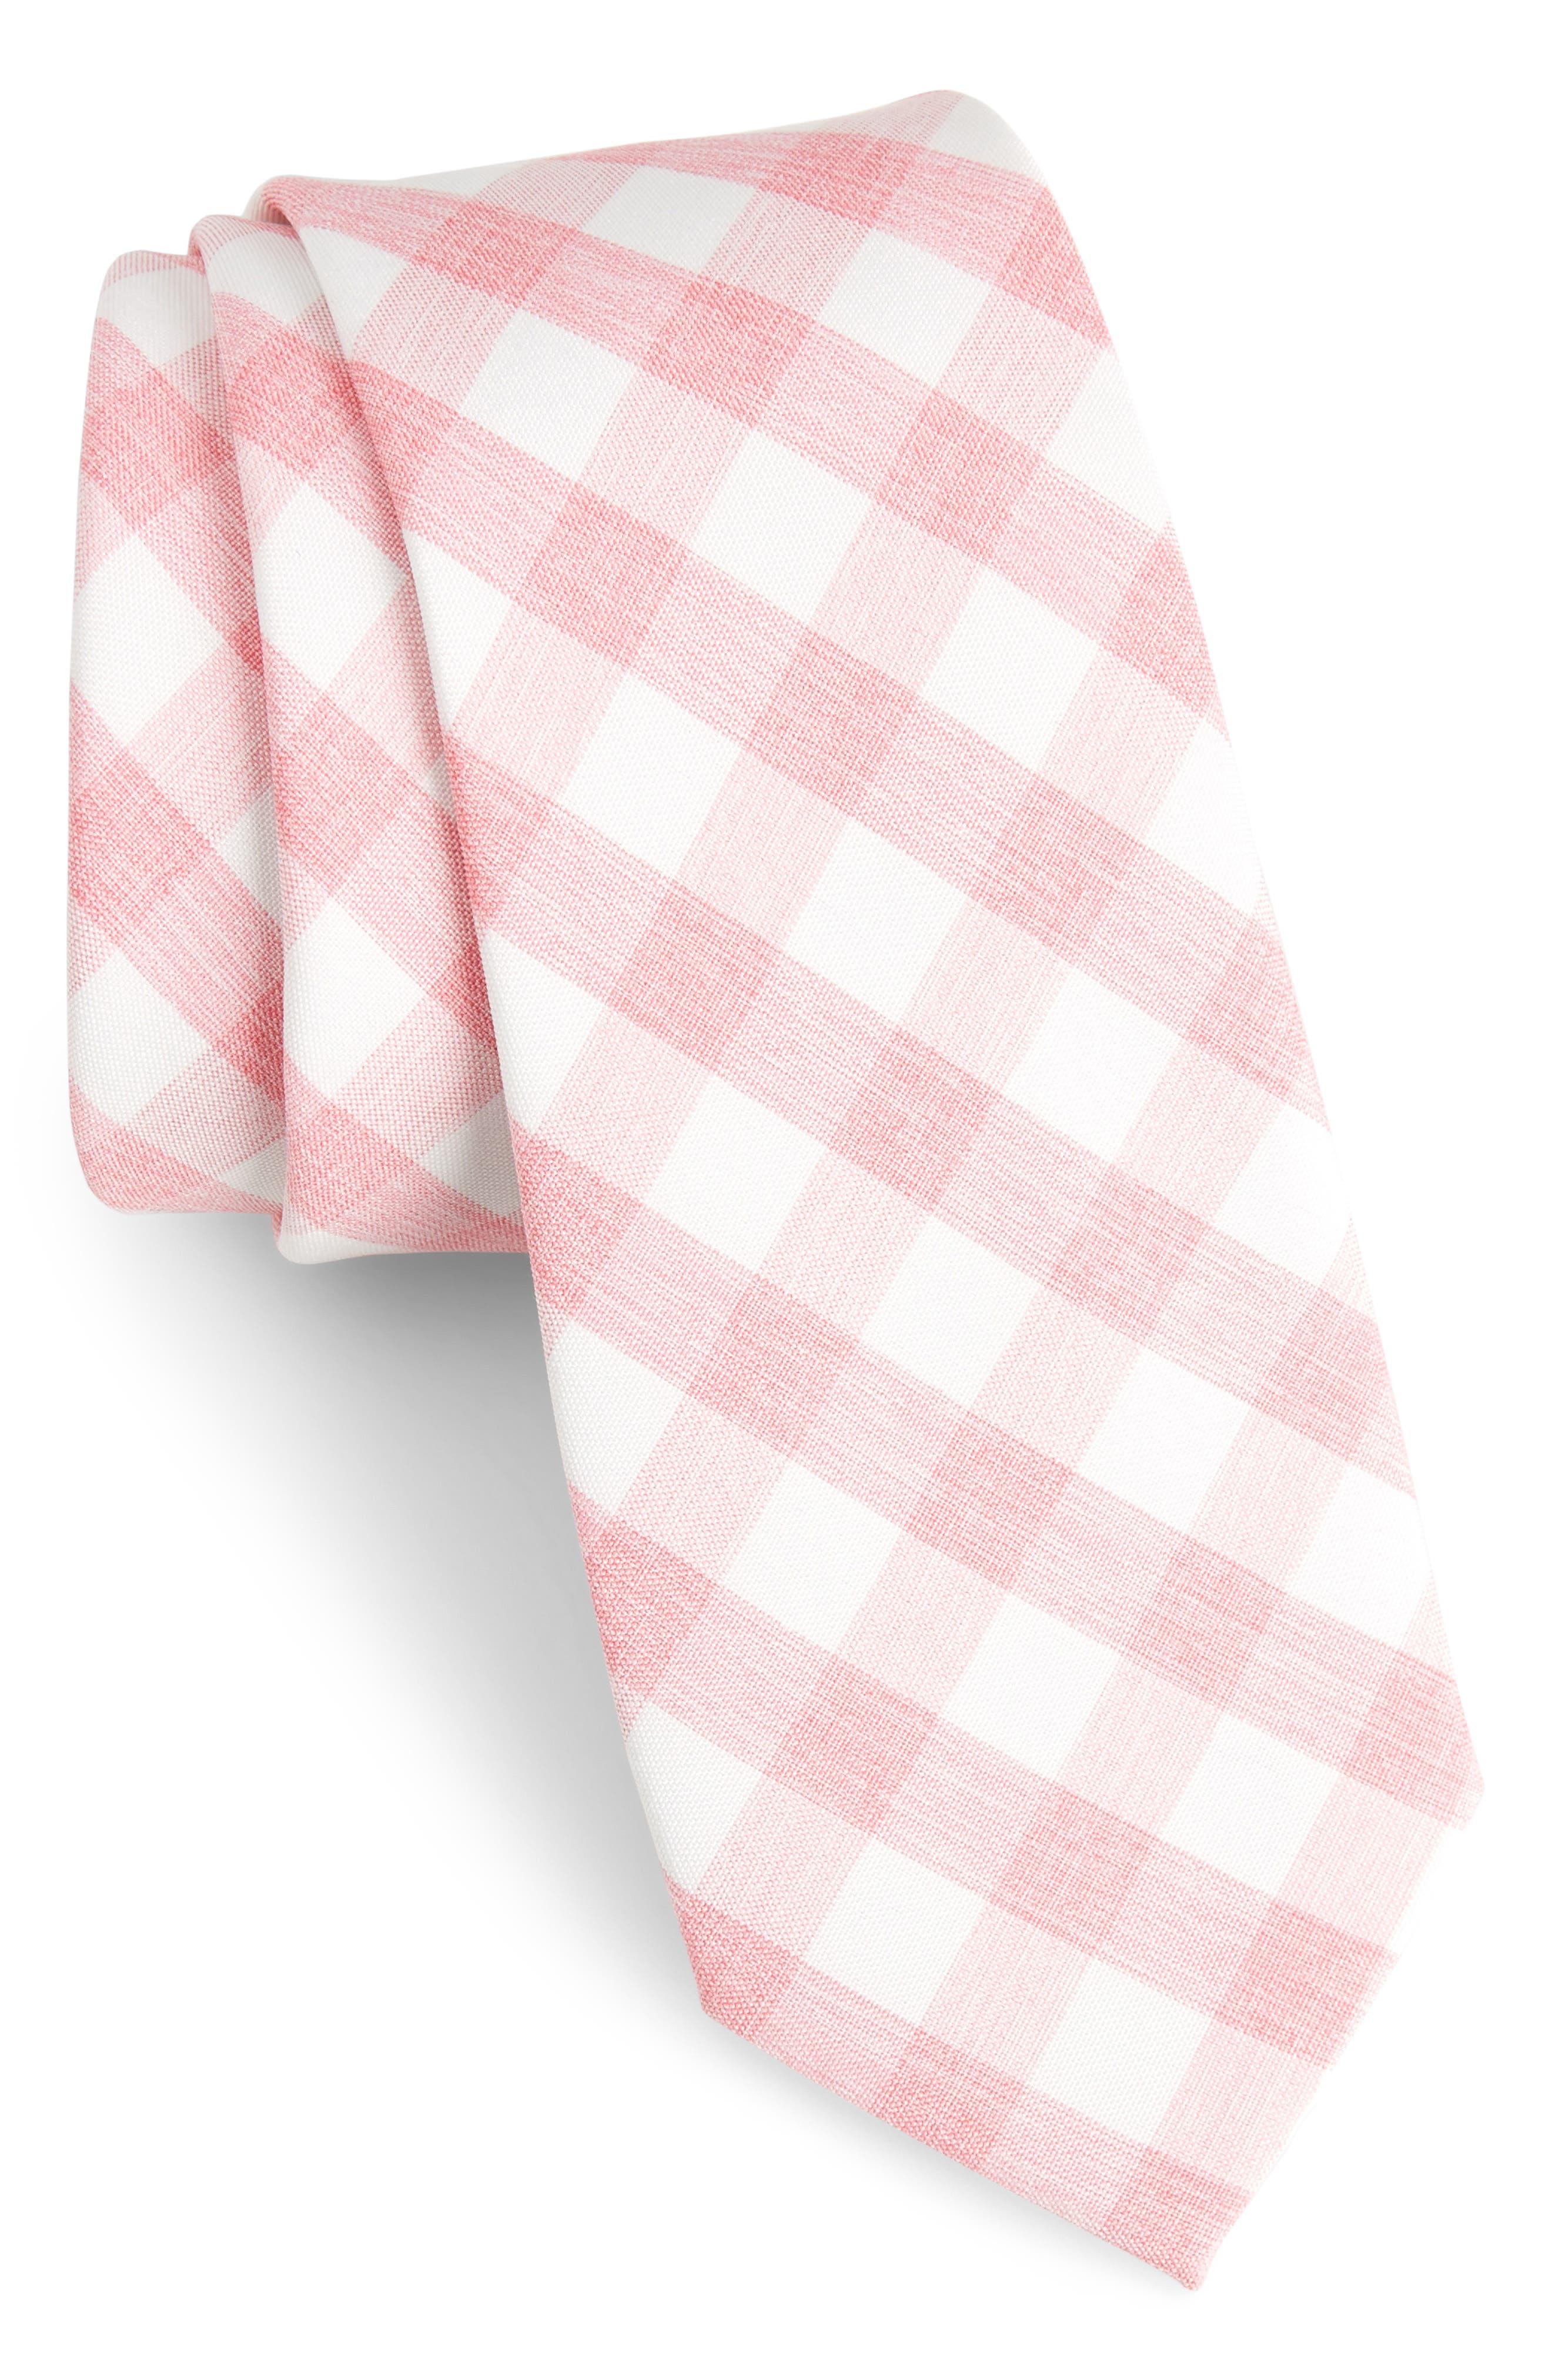 Main Image - 1901 Larkin Check Cotton Tie